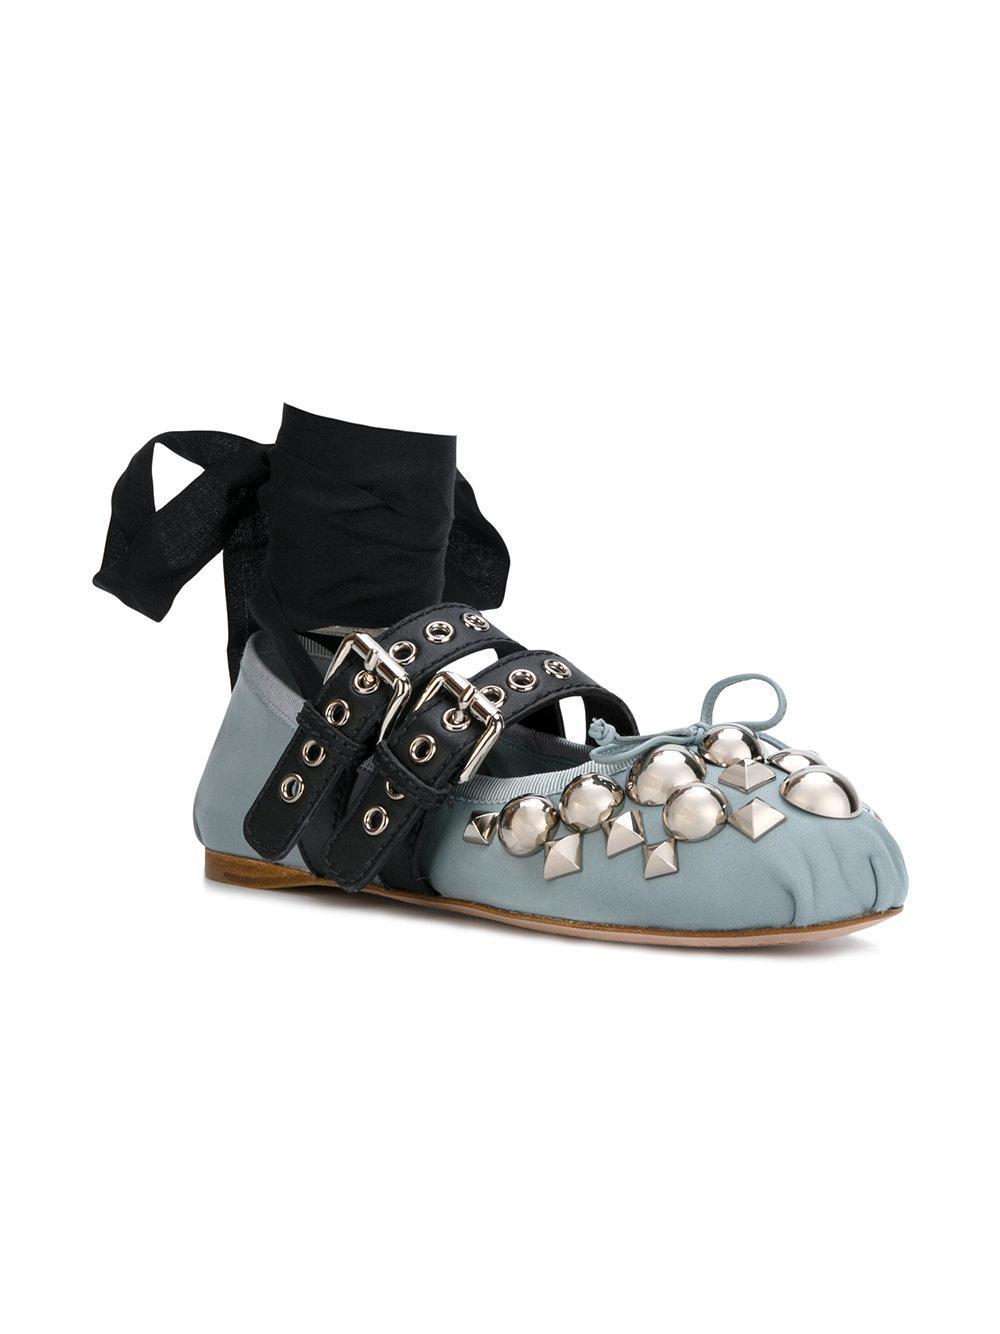 lyst miu miu embellished ballerinas in blue. Black Bedroom Furniture Sets. Home Design Ideas